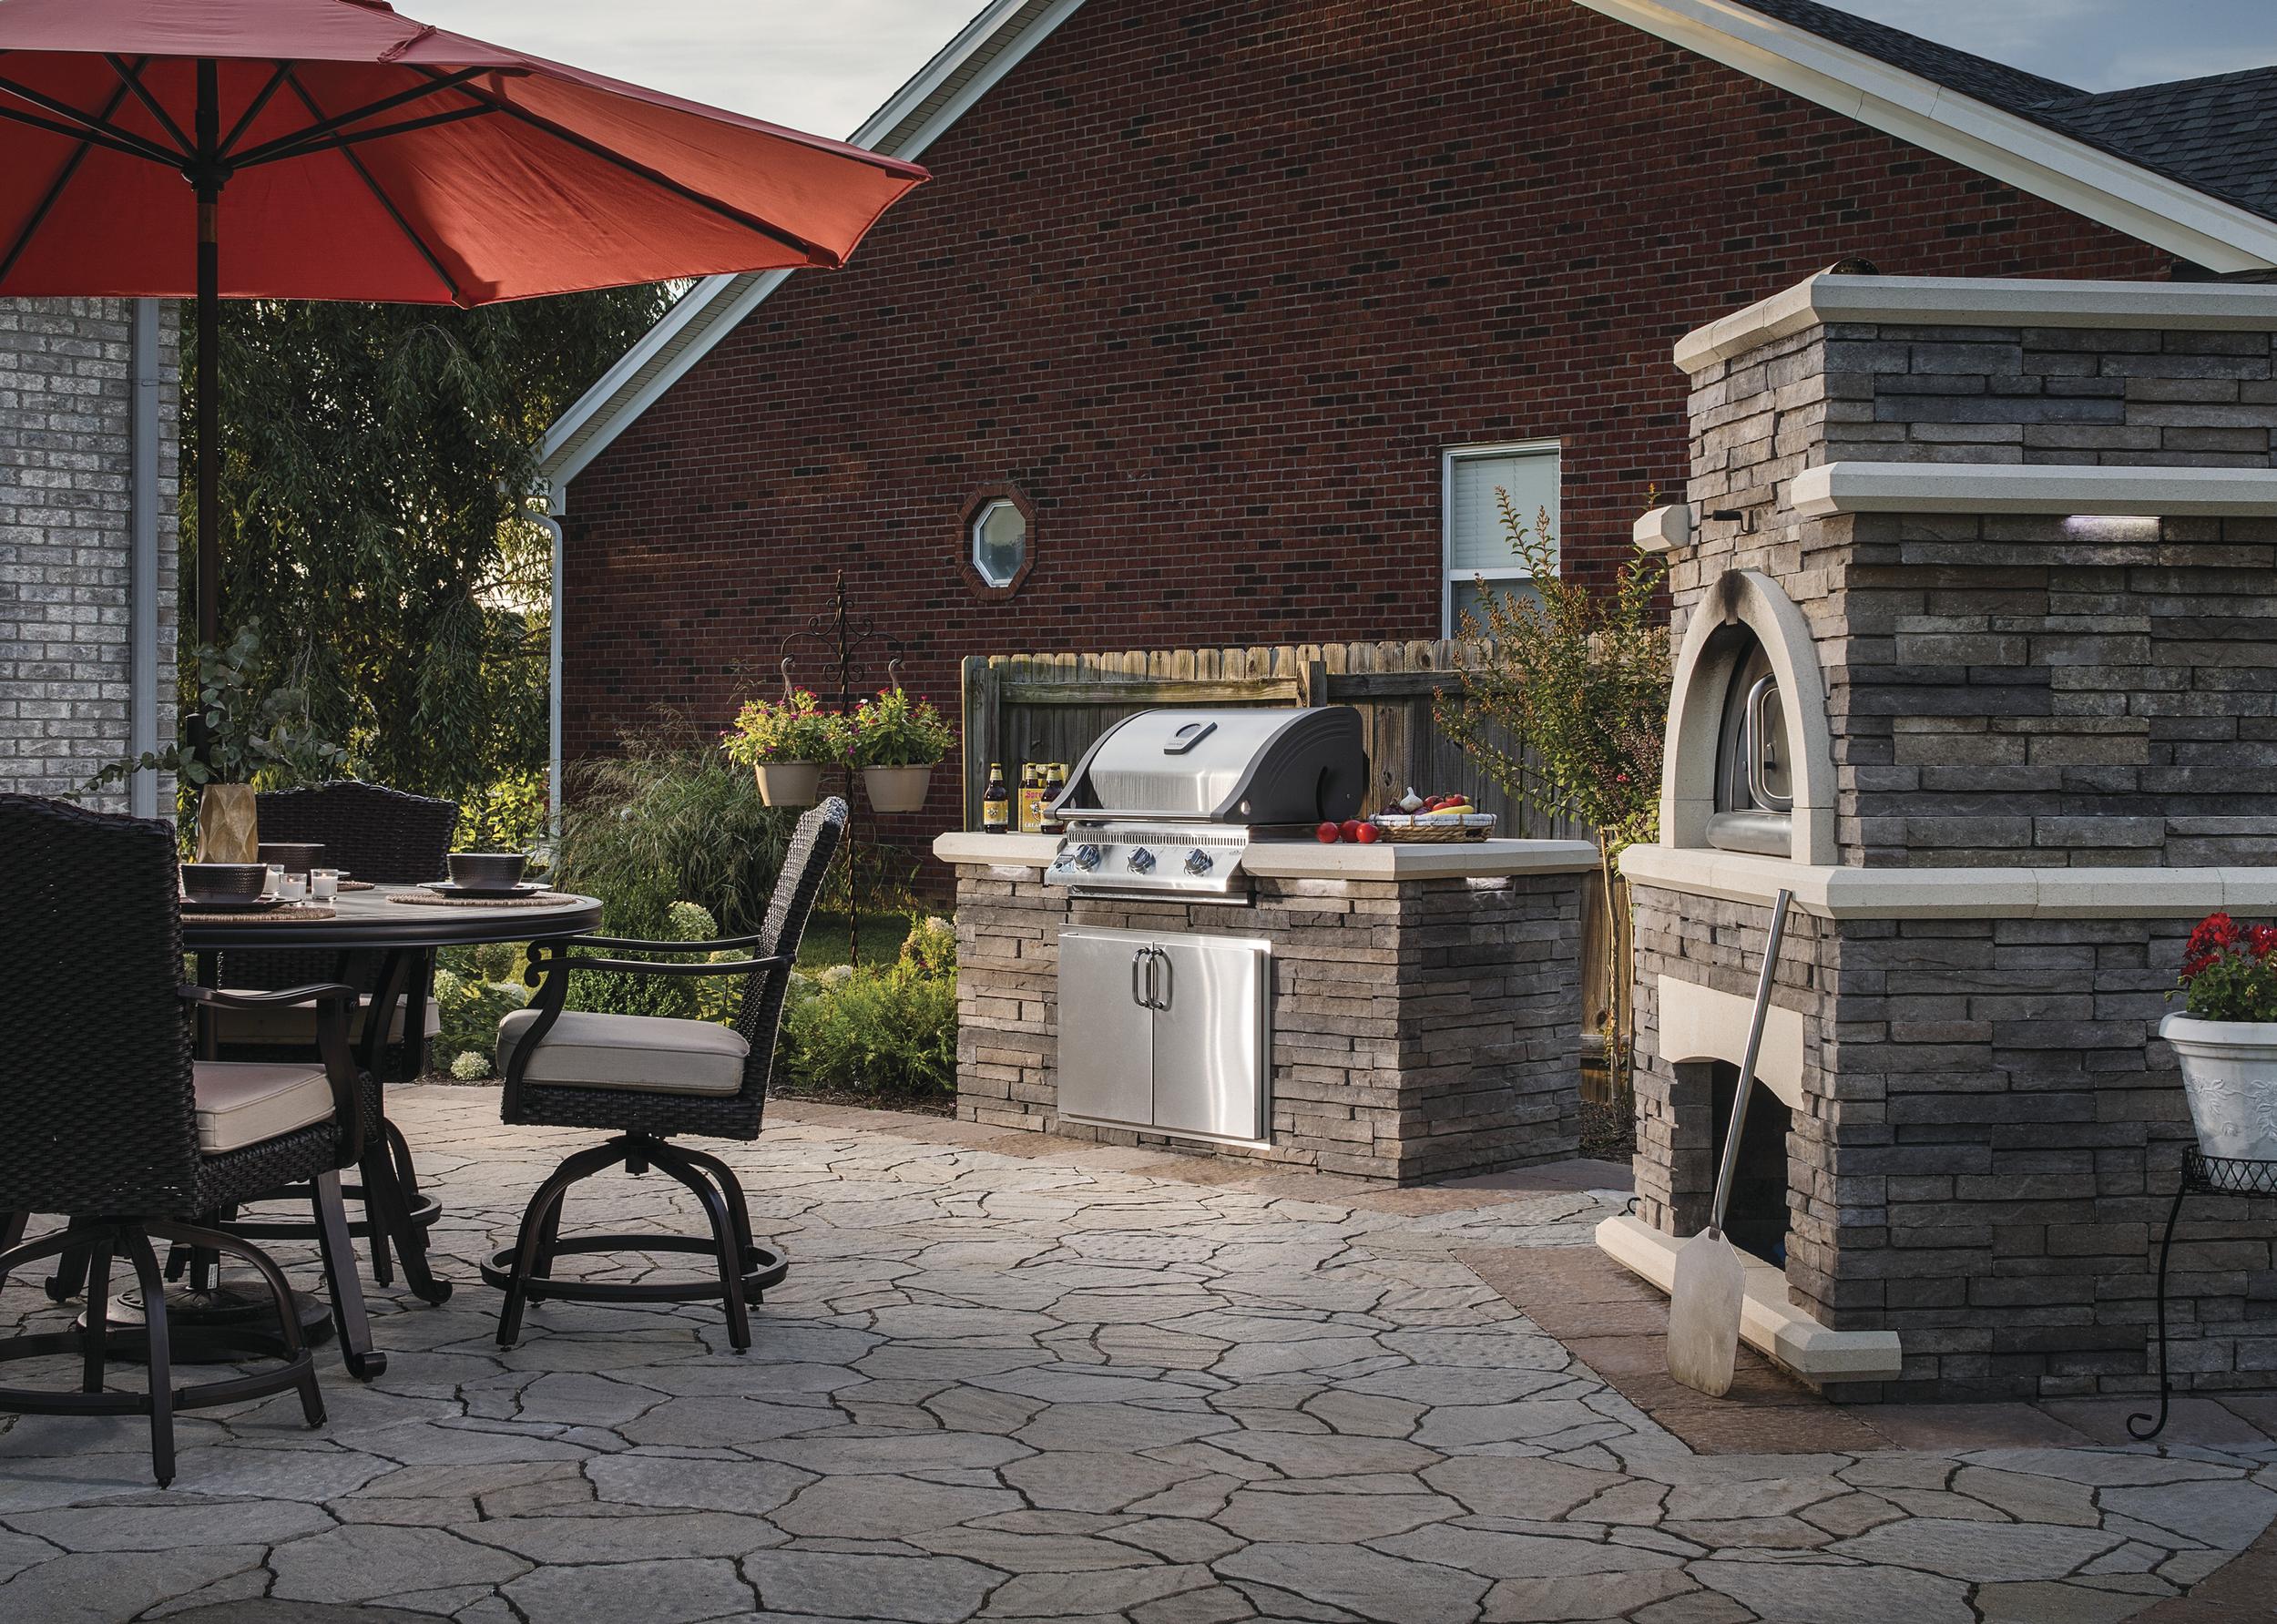 outdoor kitchen pizza kitchen dining brick oven patio landscape design plants